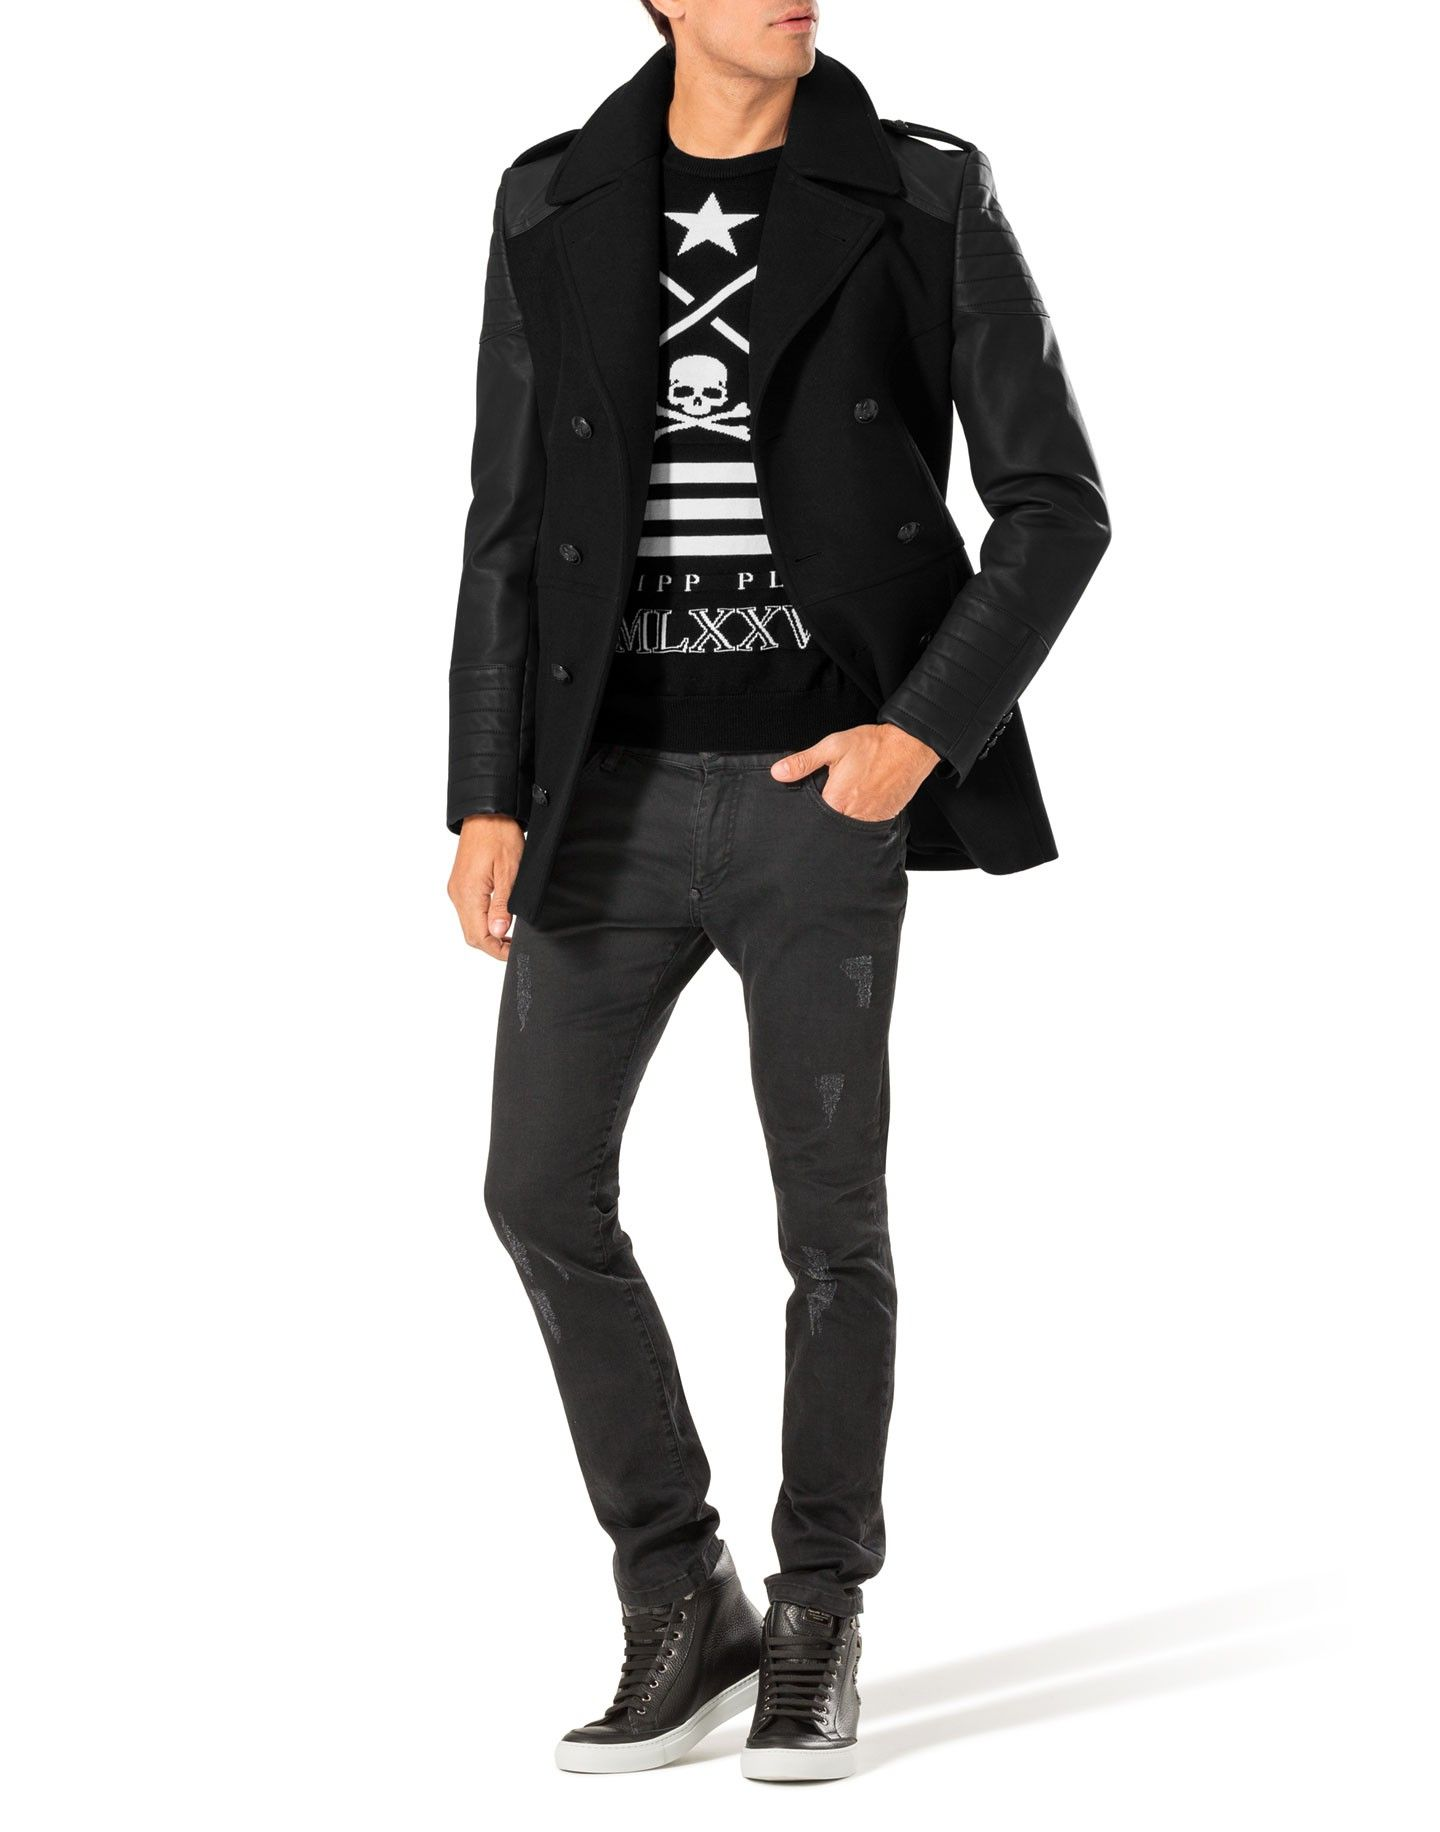 Coat Speechless Coats Jackets Clothing Men Philipp Plein Mens Outfits Jacket Outfits Clothes [ 1832 x 1440 Pixel ]